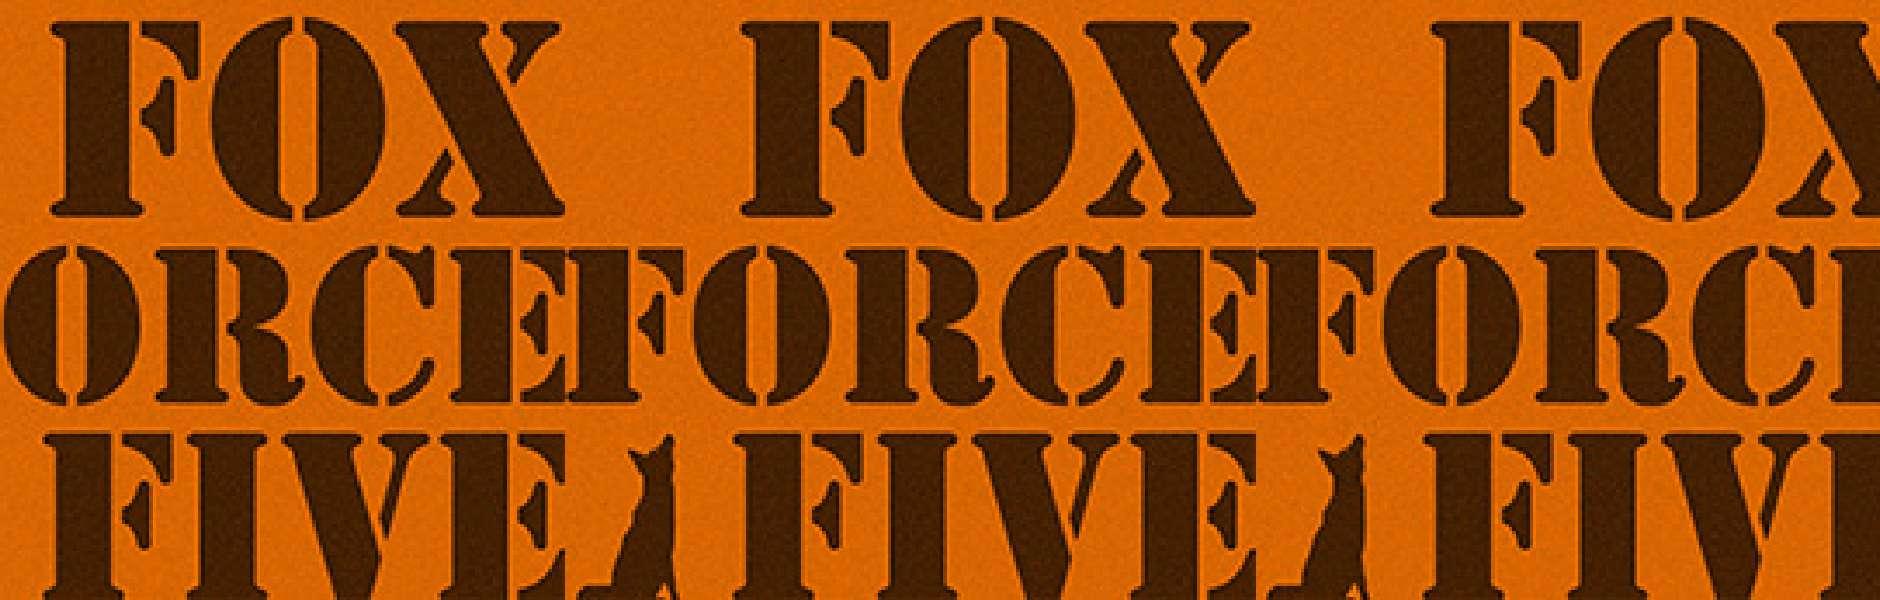 Fox Force Five